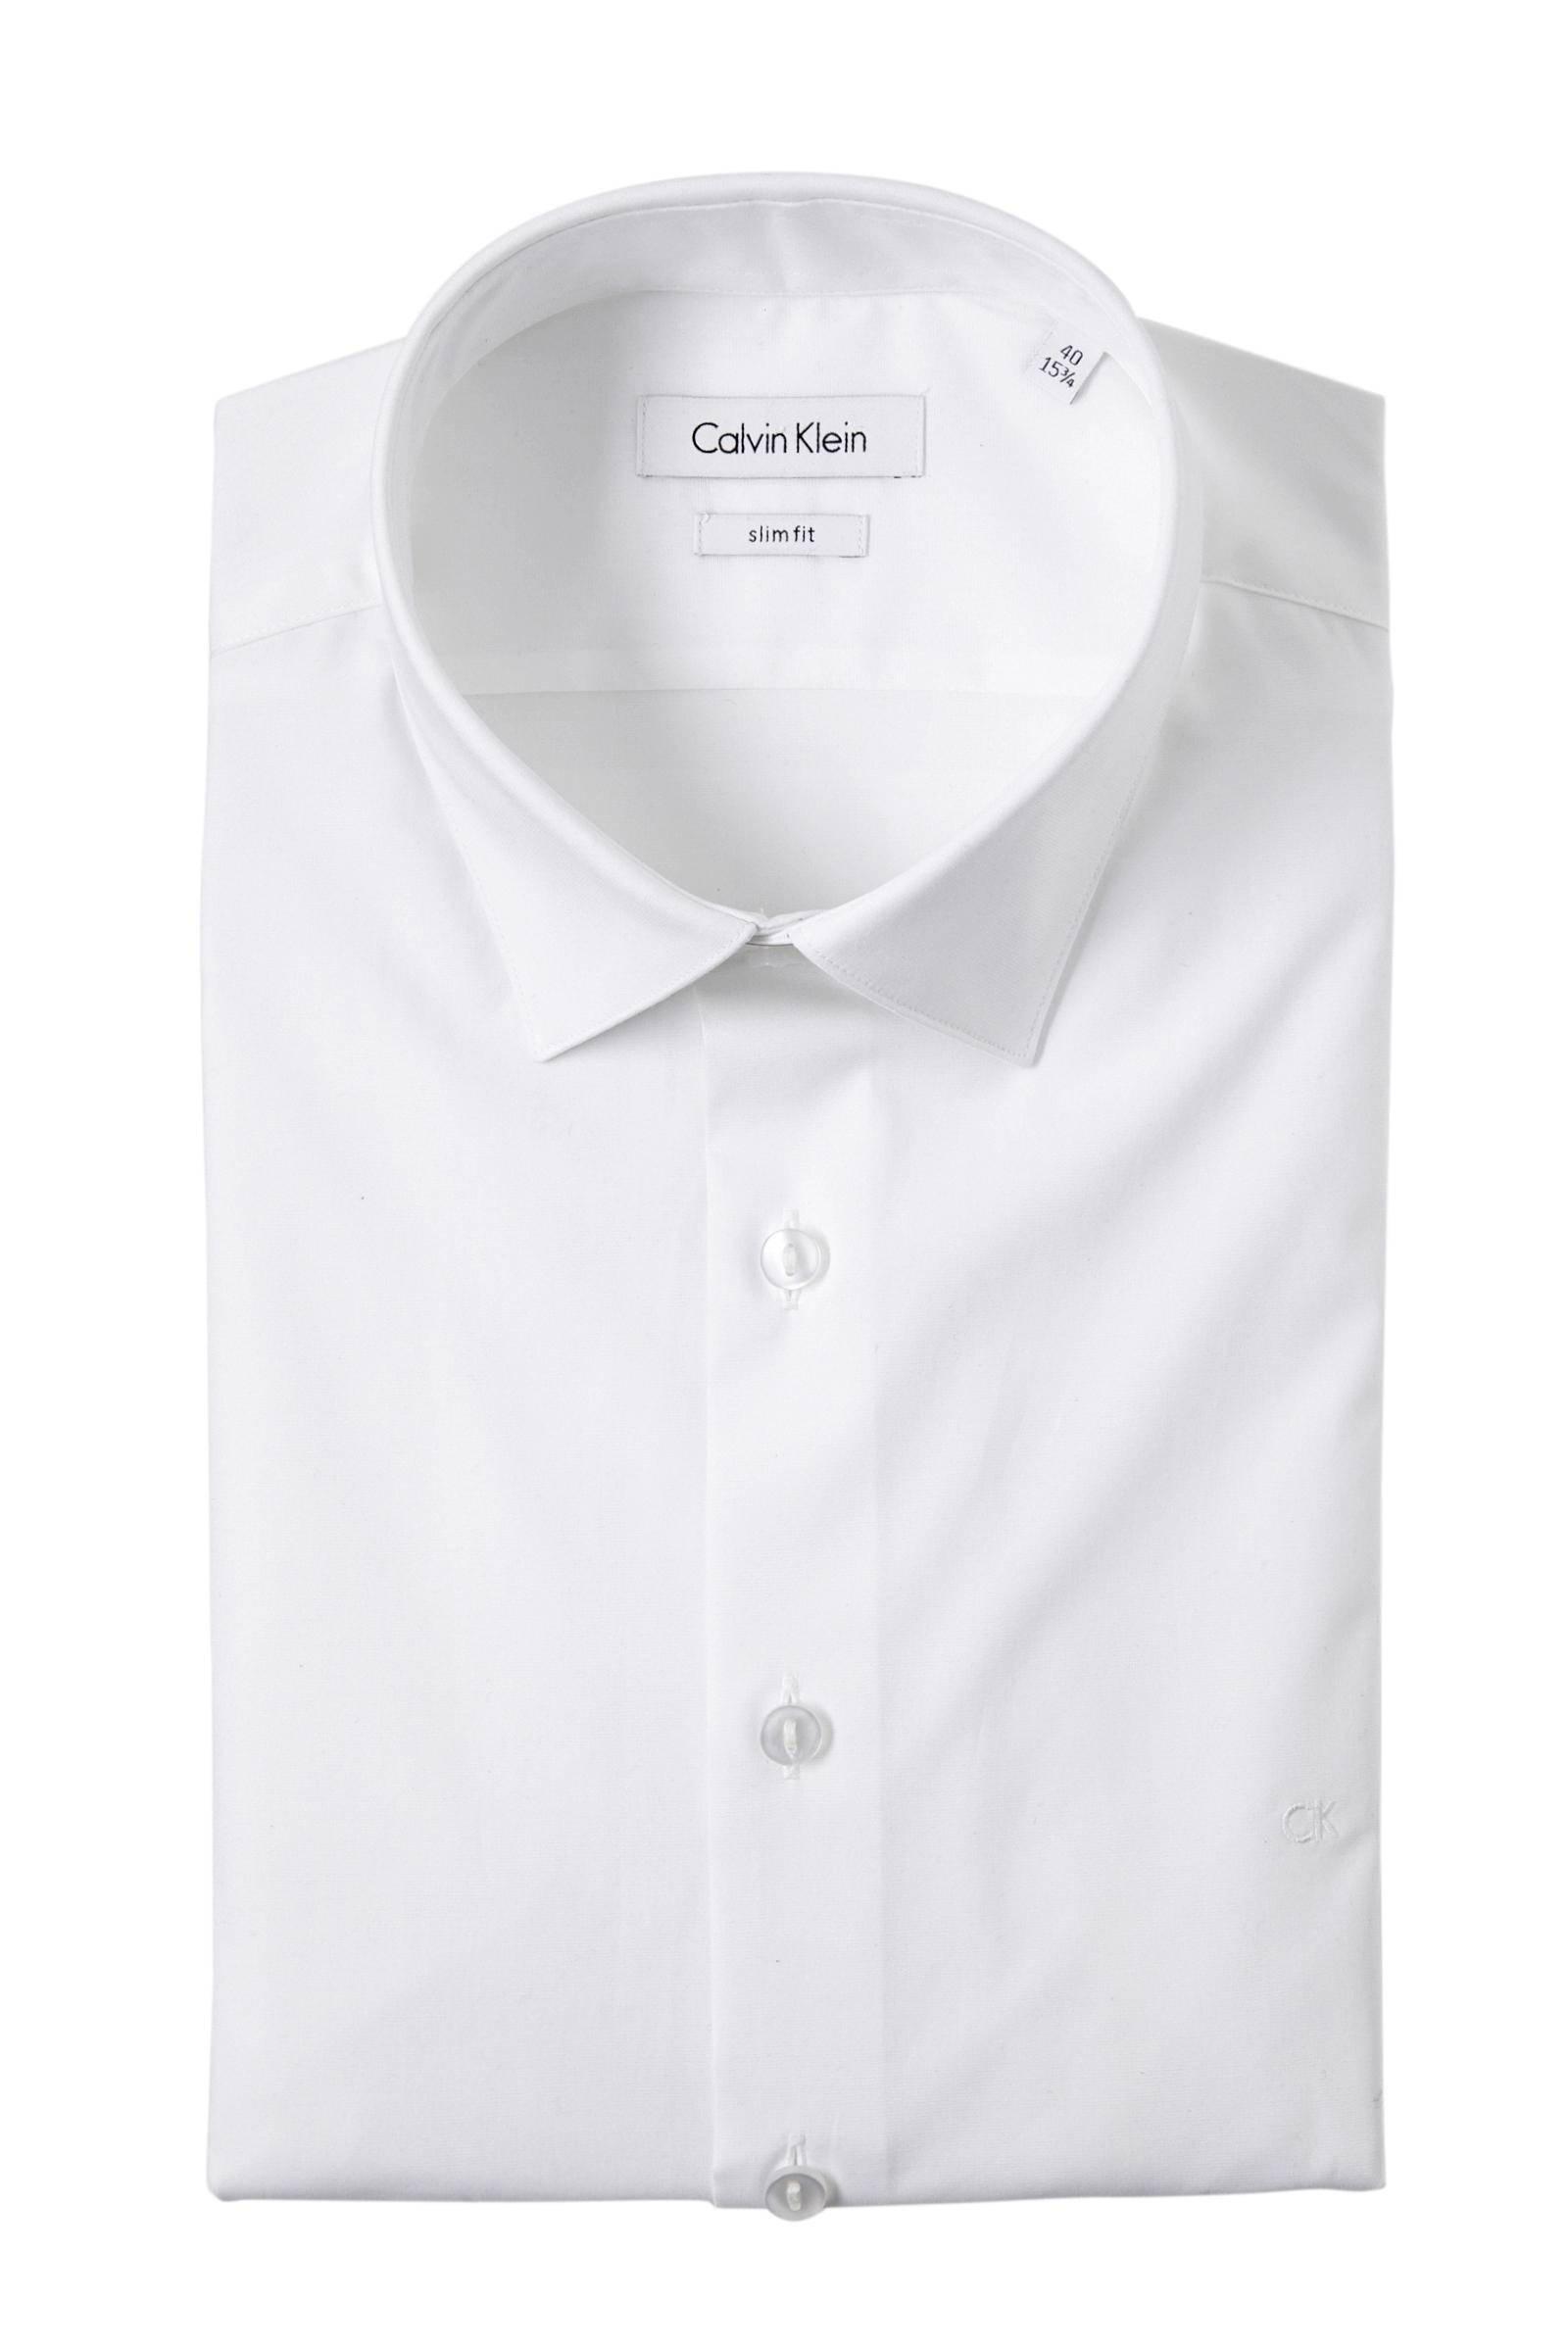 5abf51e5a74 calvin-klein-slim-fit-overhemd-bari-wit-8718655716840.jpg